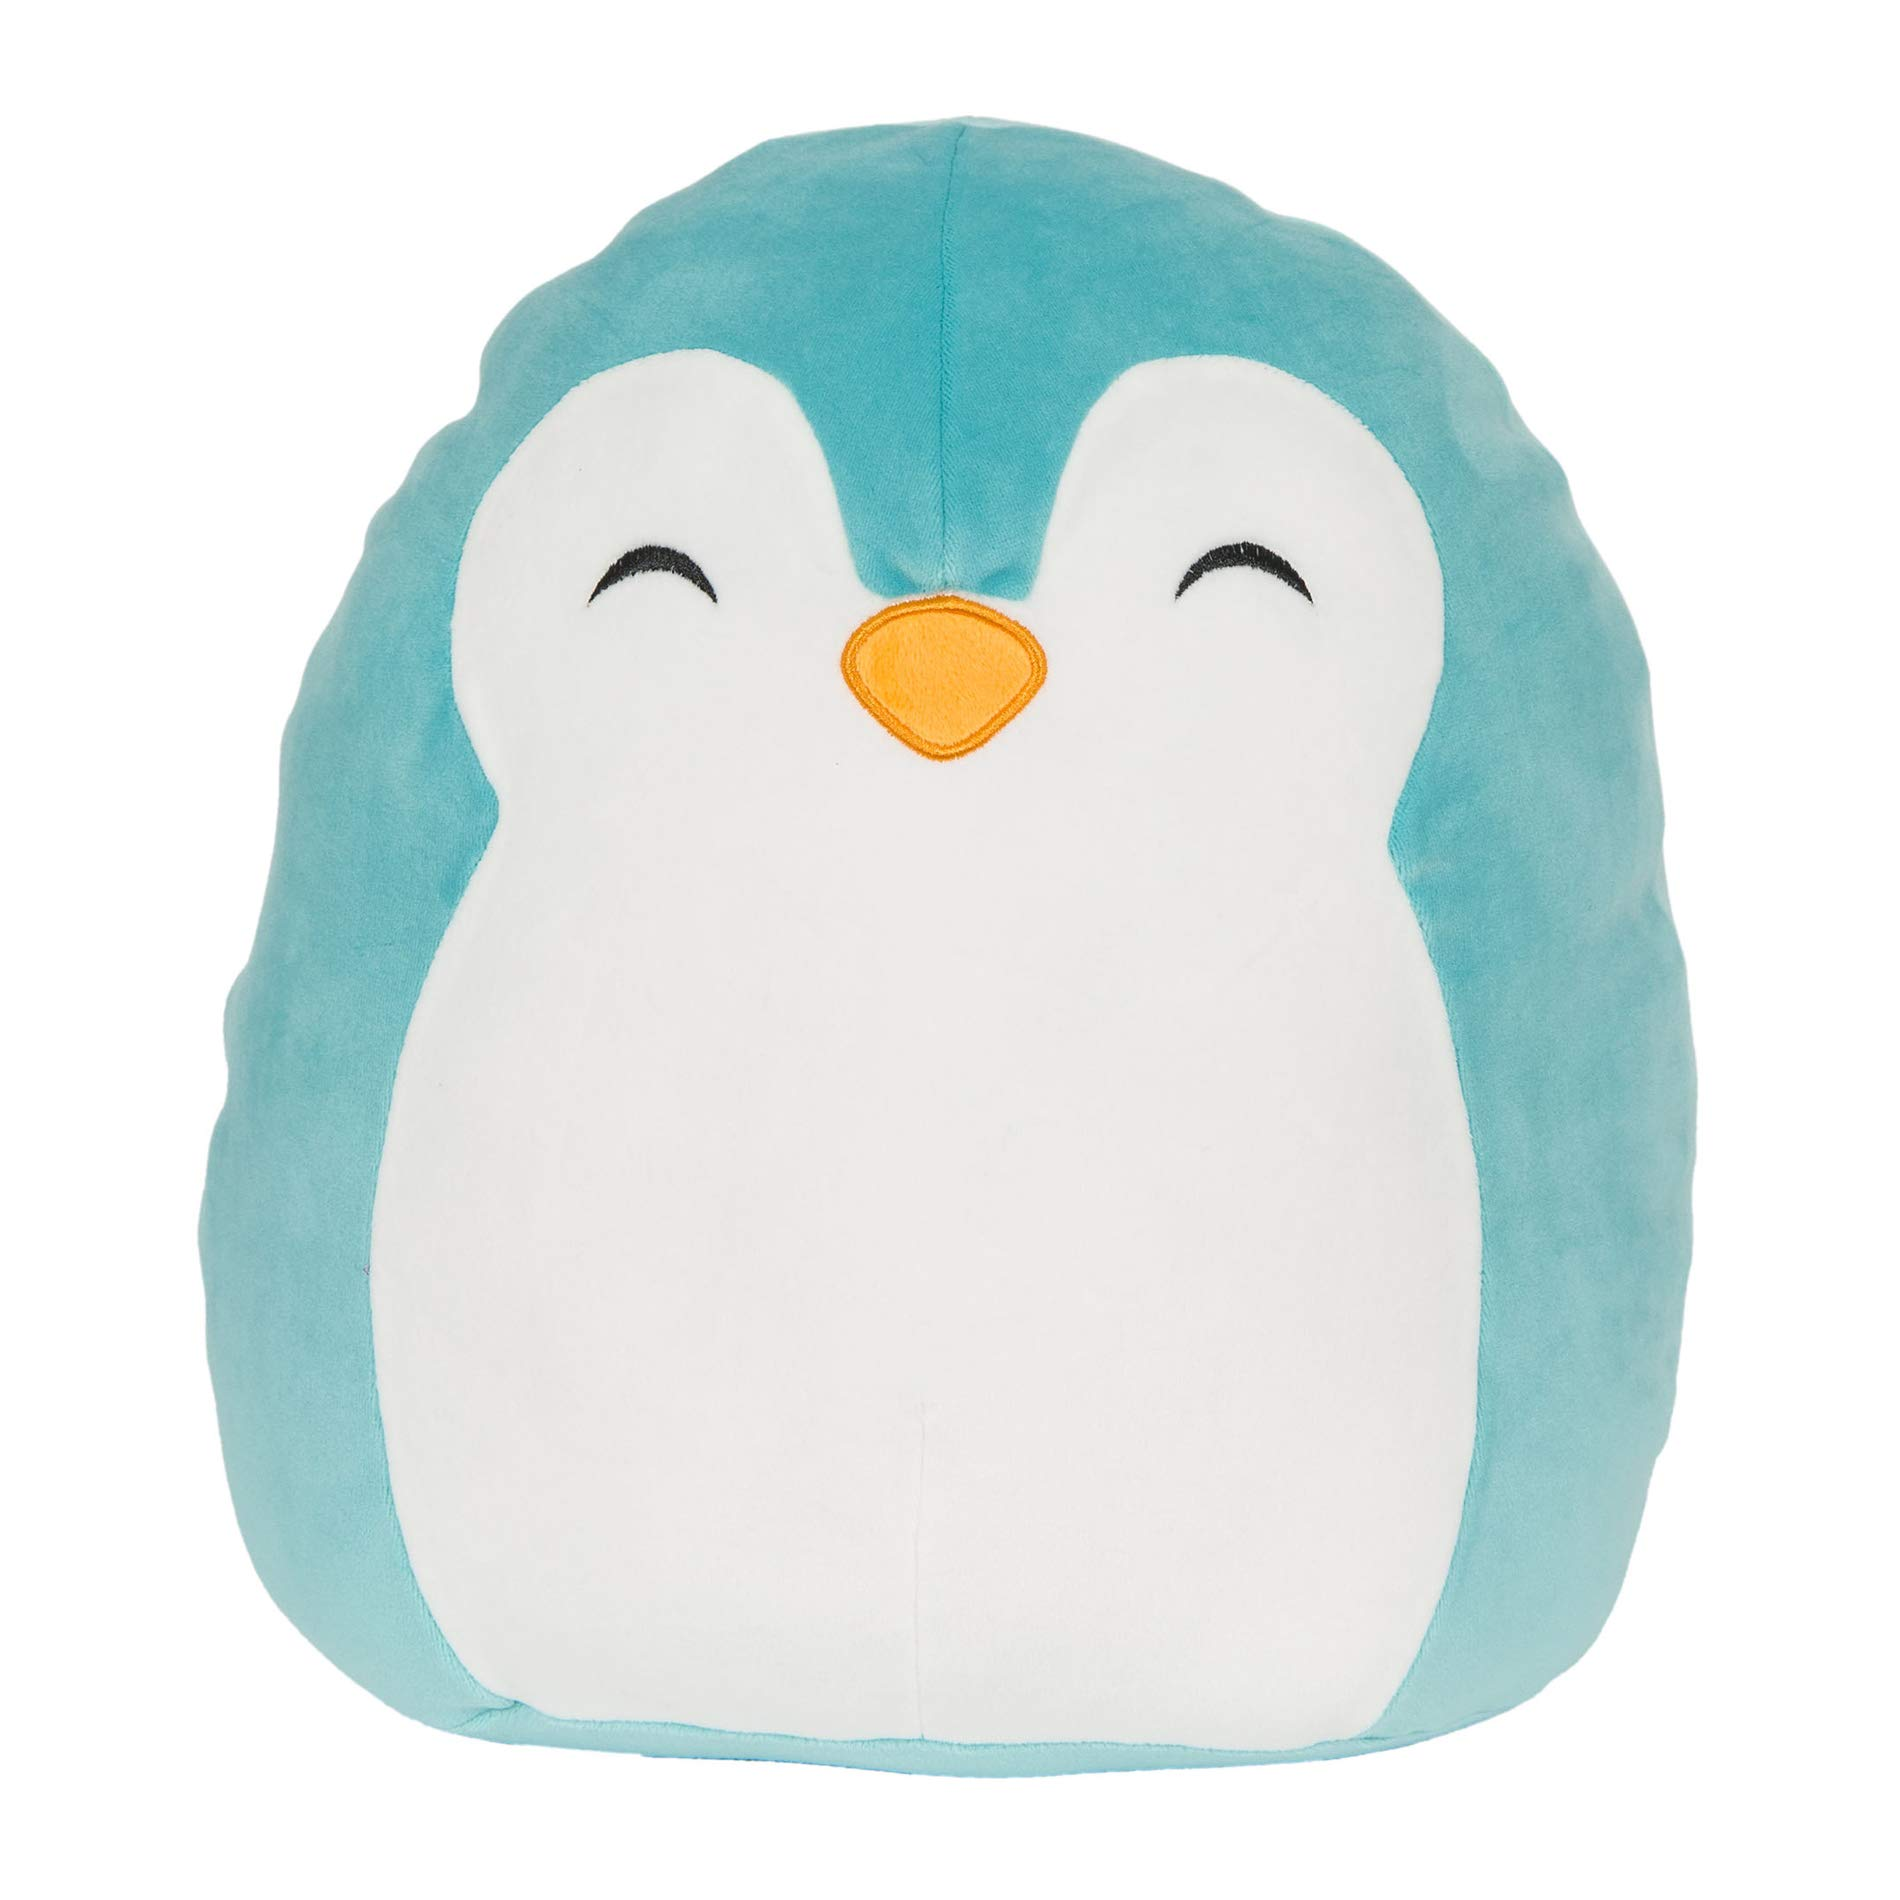 Squishmallow Original Kellytoy Teal Penguin Tanner  16'' Super Soft Plush Toy Stuffed Animal Pet Pillow Gift